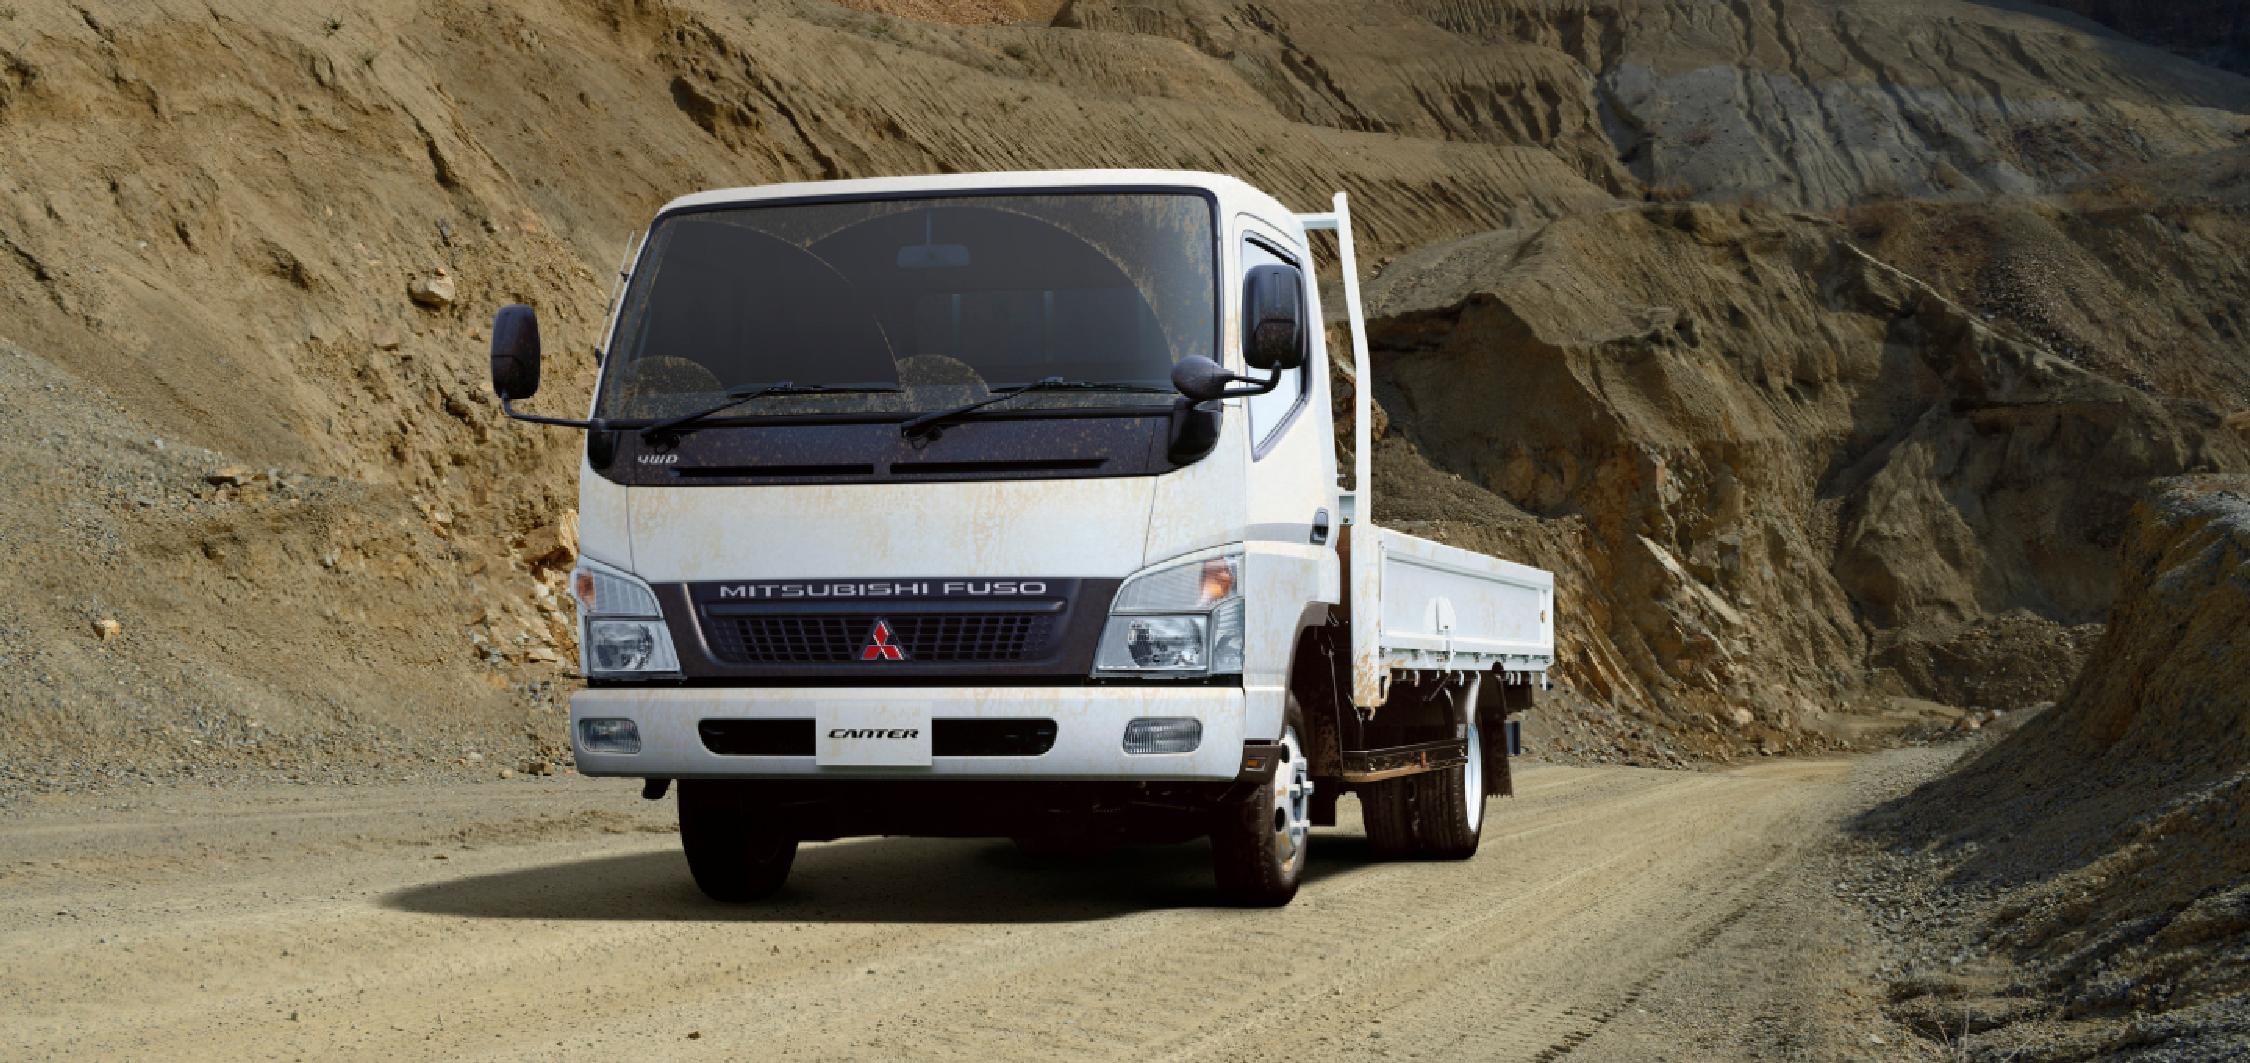 manejo_camiones_tips